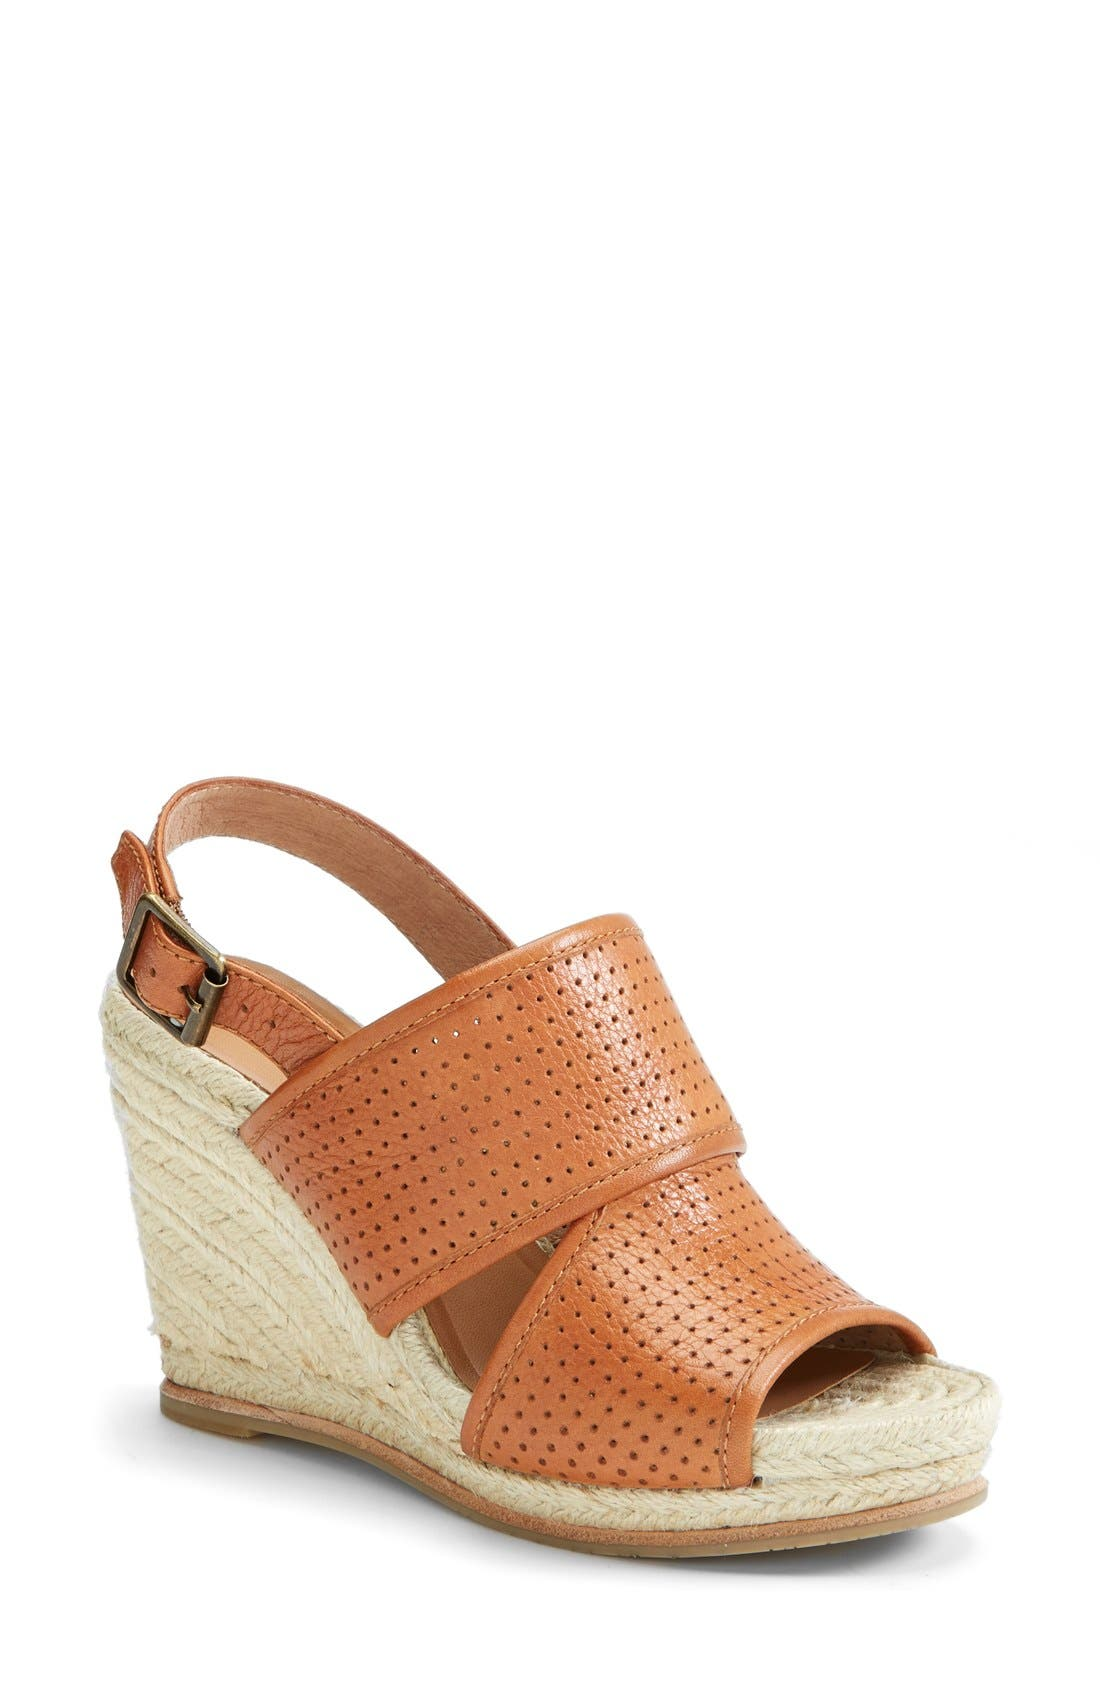 Alternate Image 1 Selected - Biala 'Joyce' Perforated Espadrille Wedge Sandal (Women)